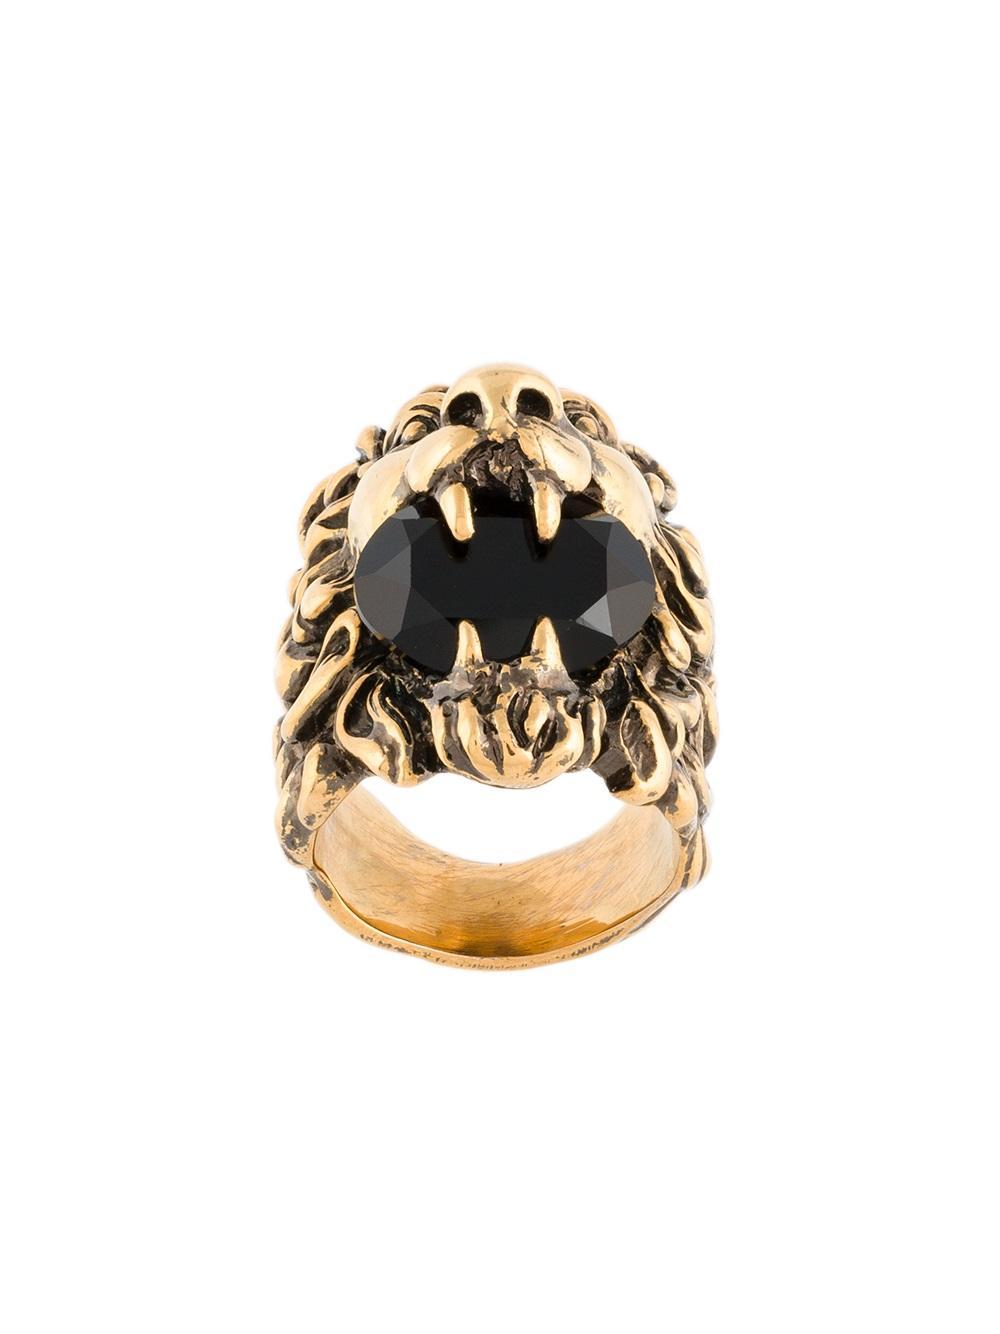 47babe01e67fe Acheter bijoux gucci pas cher